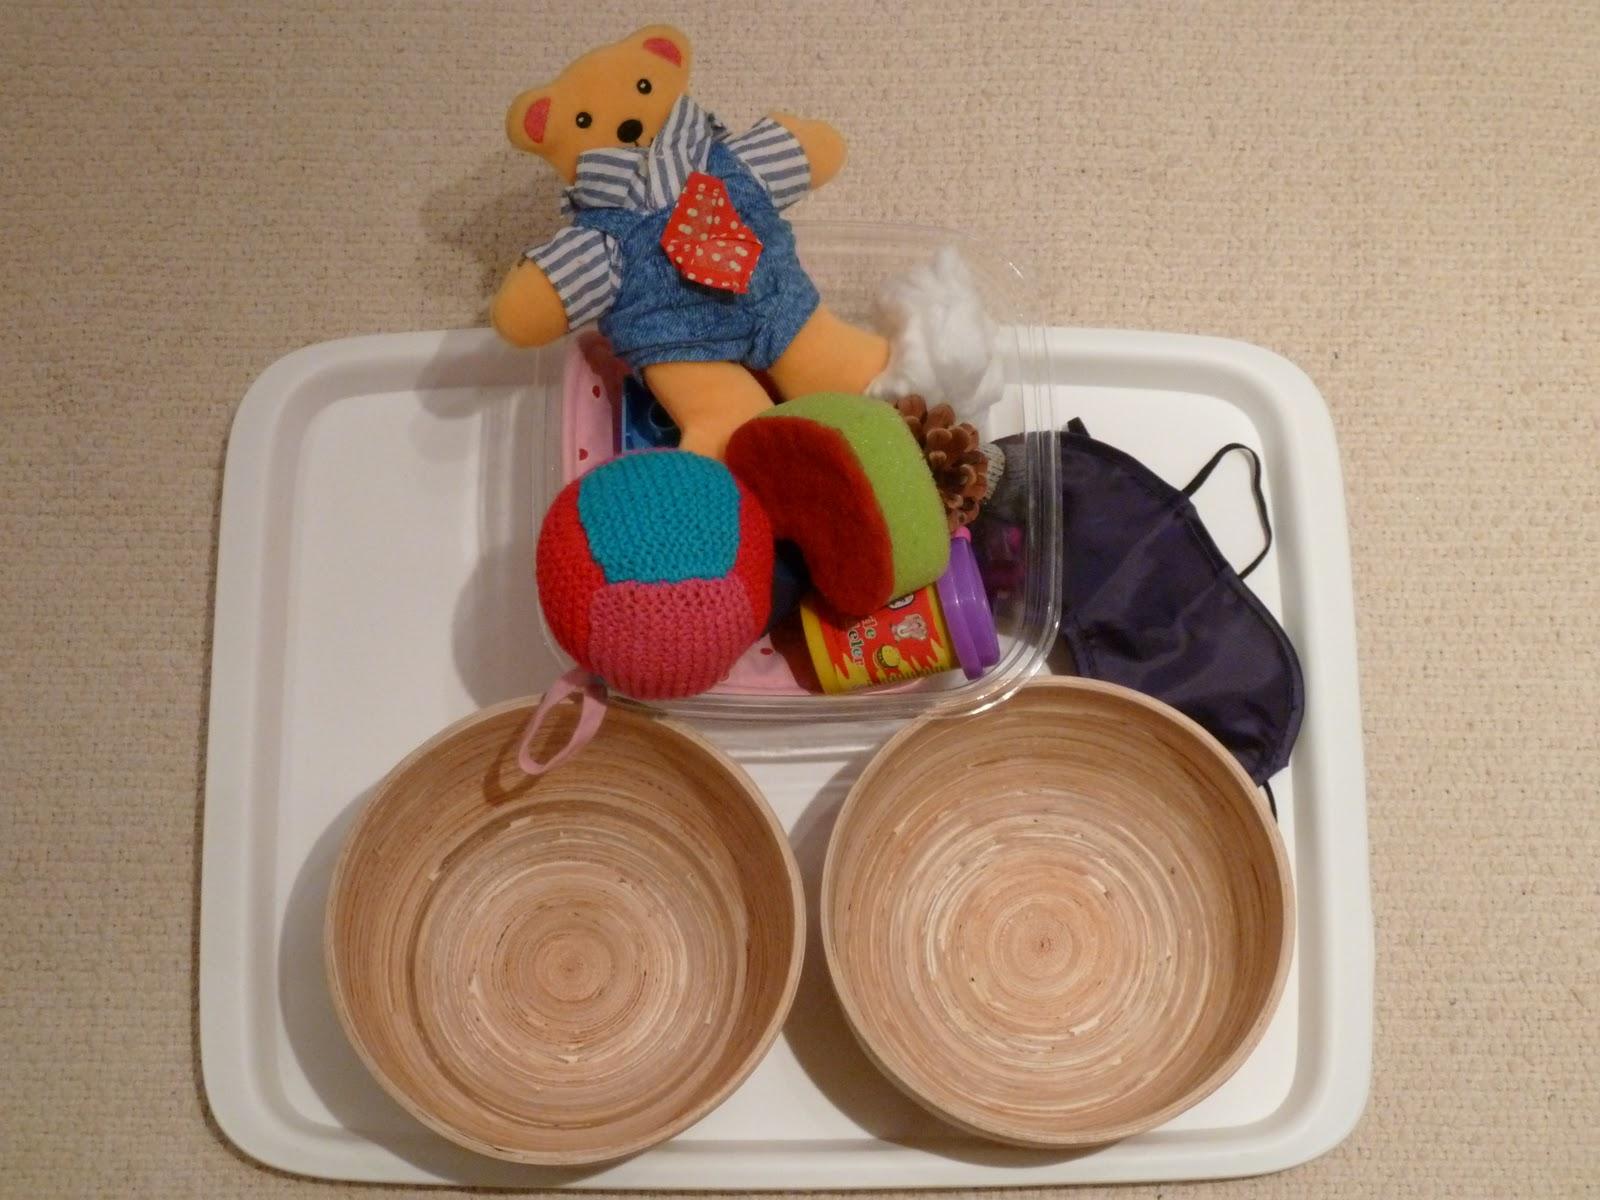 Family Fecs Montessori Activity Sorting Hard Amp Soft Objects